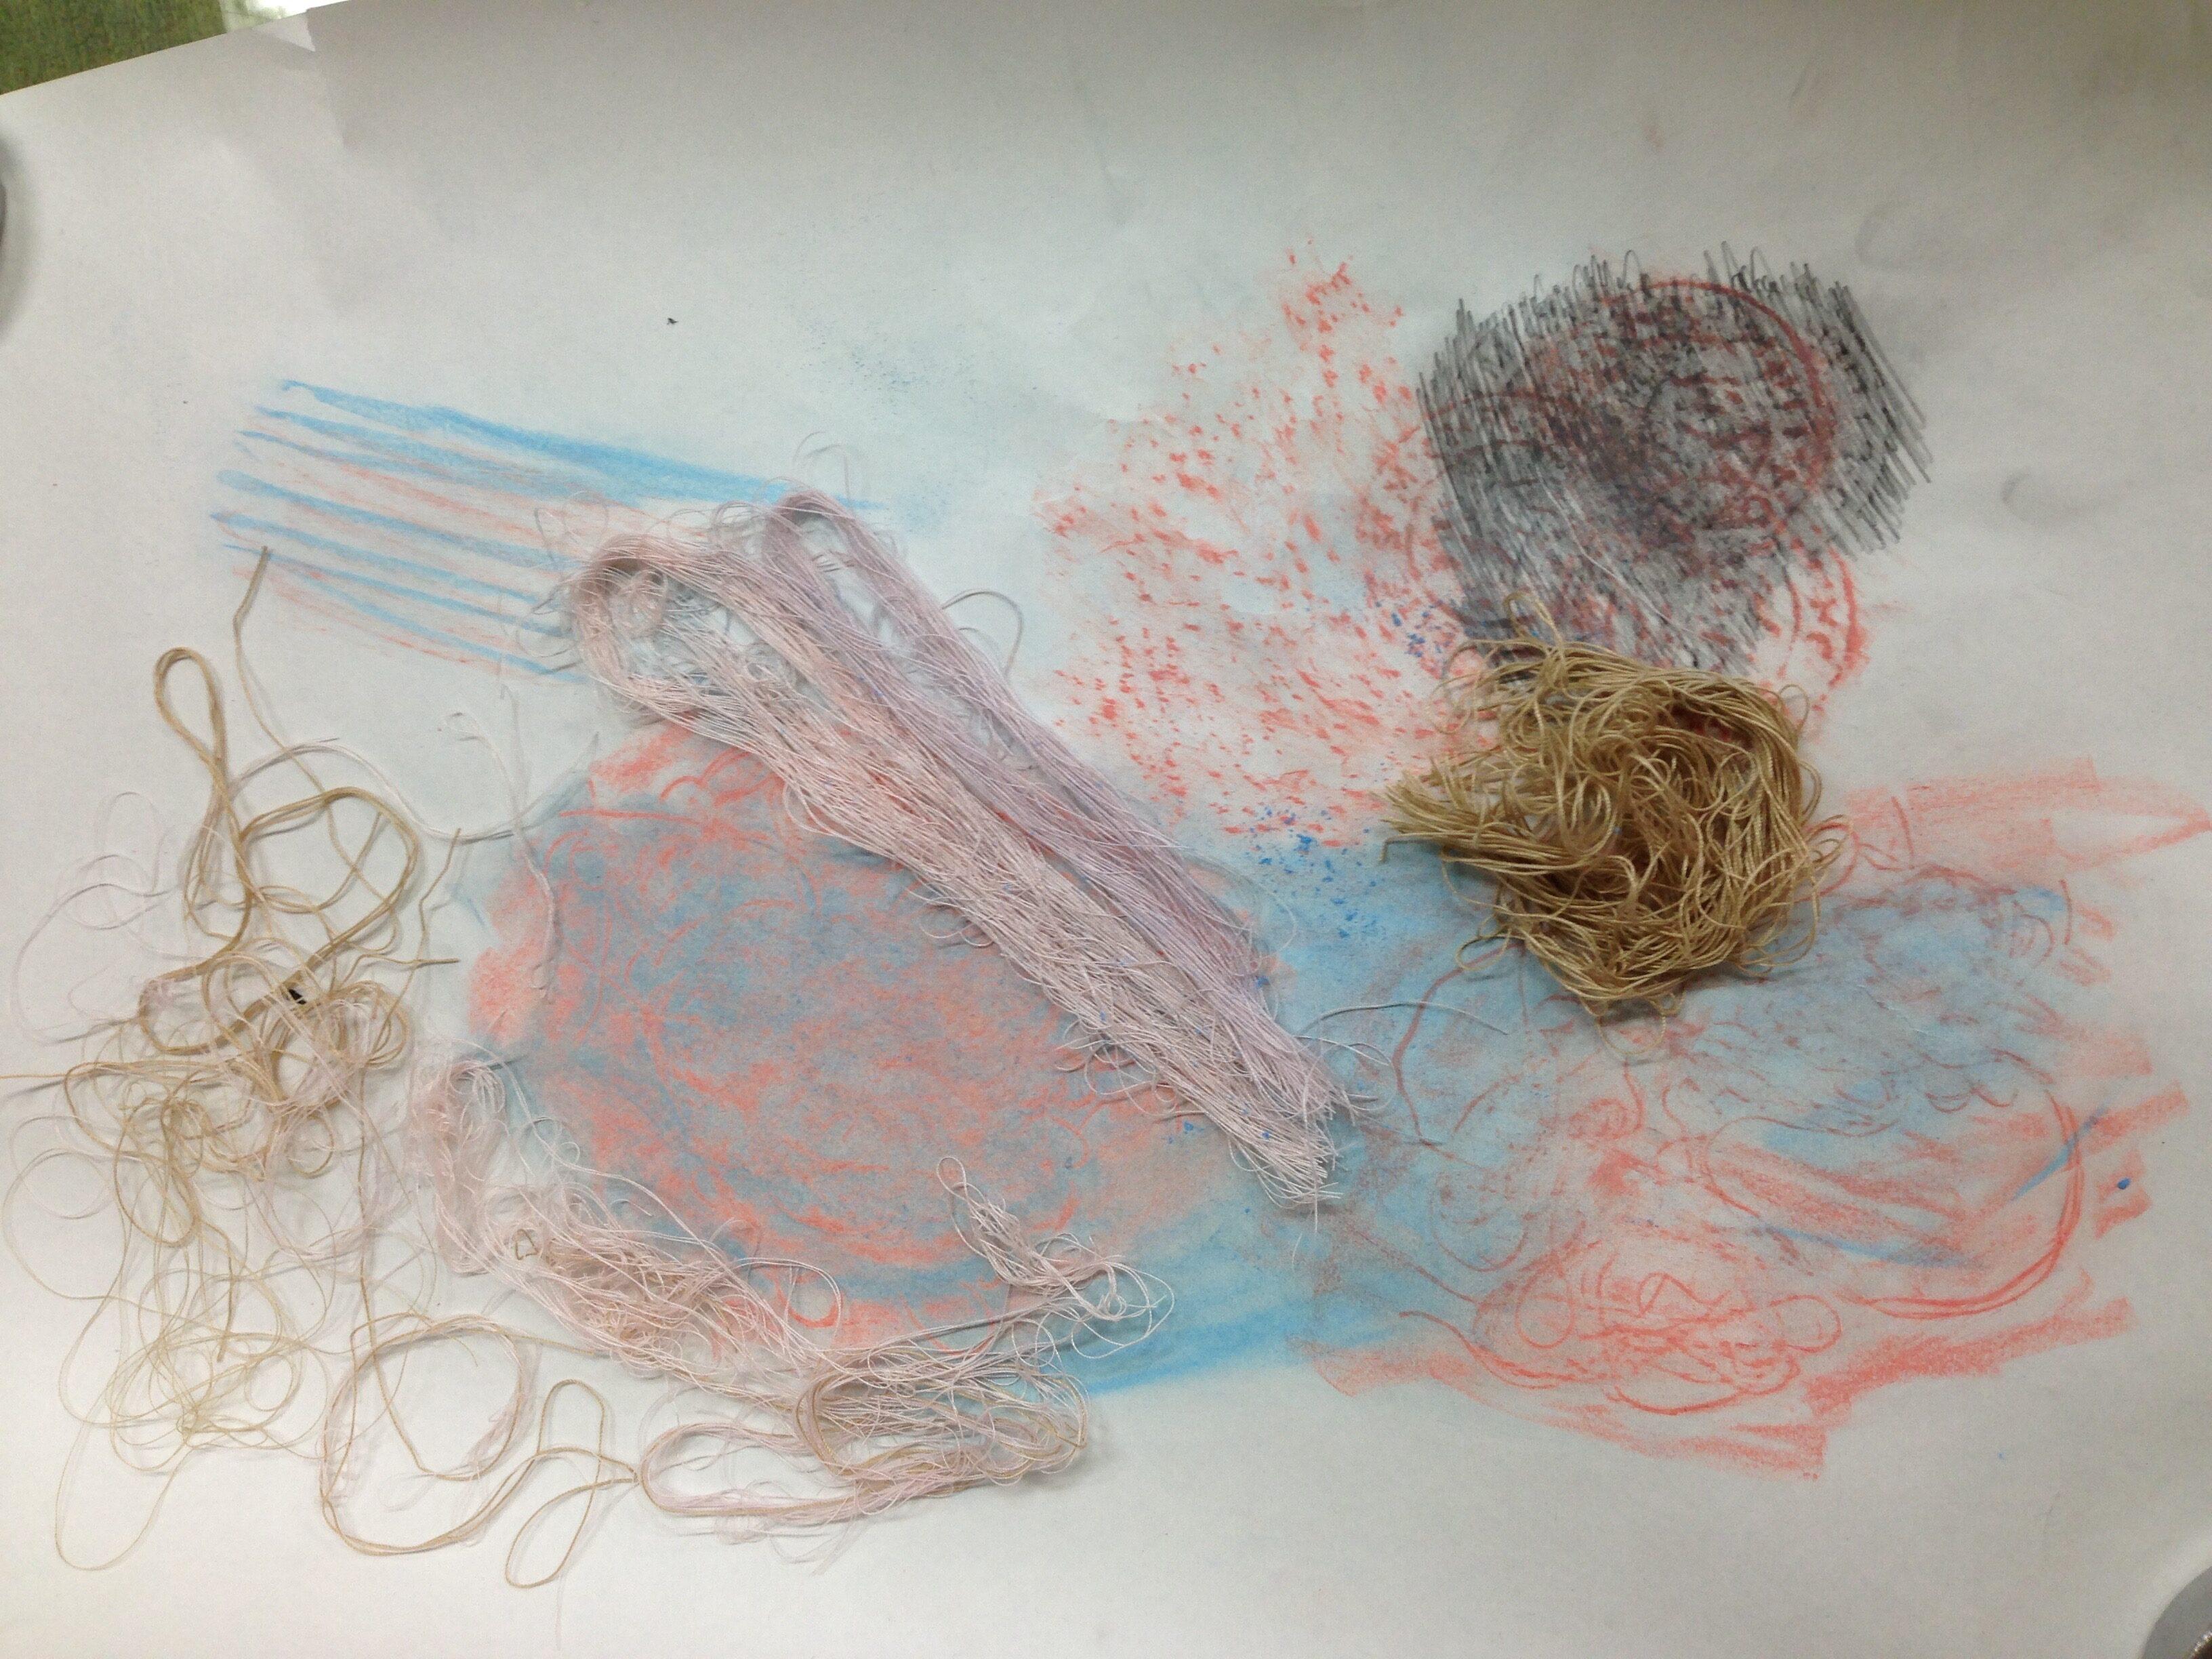 Study of textures